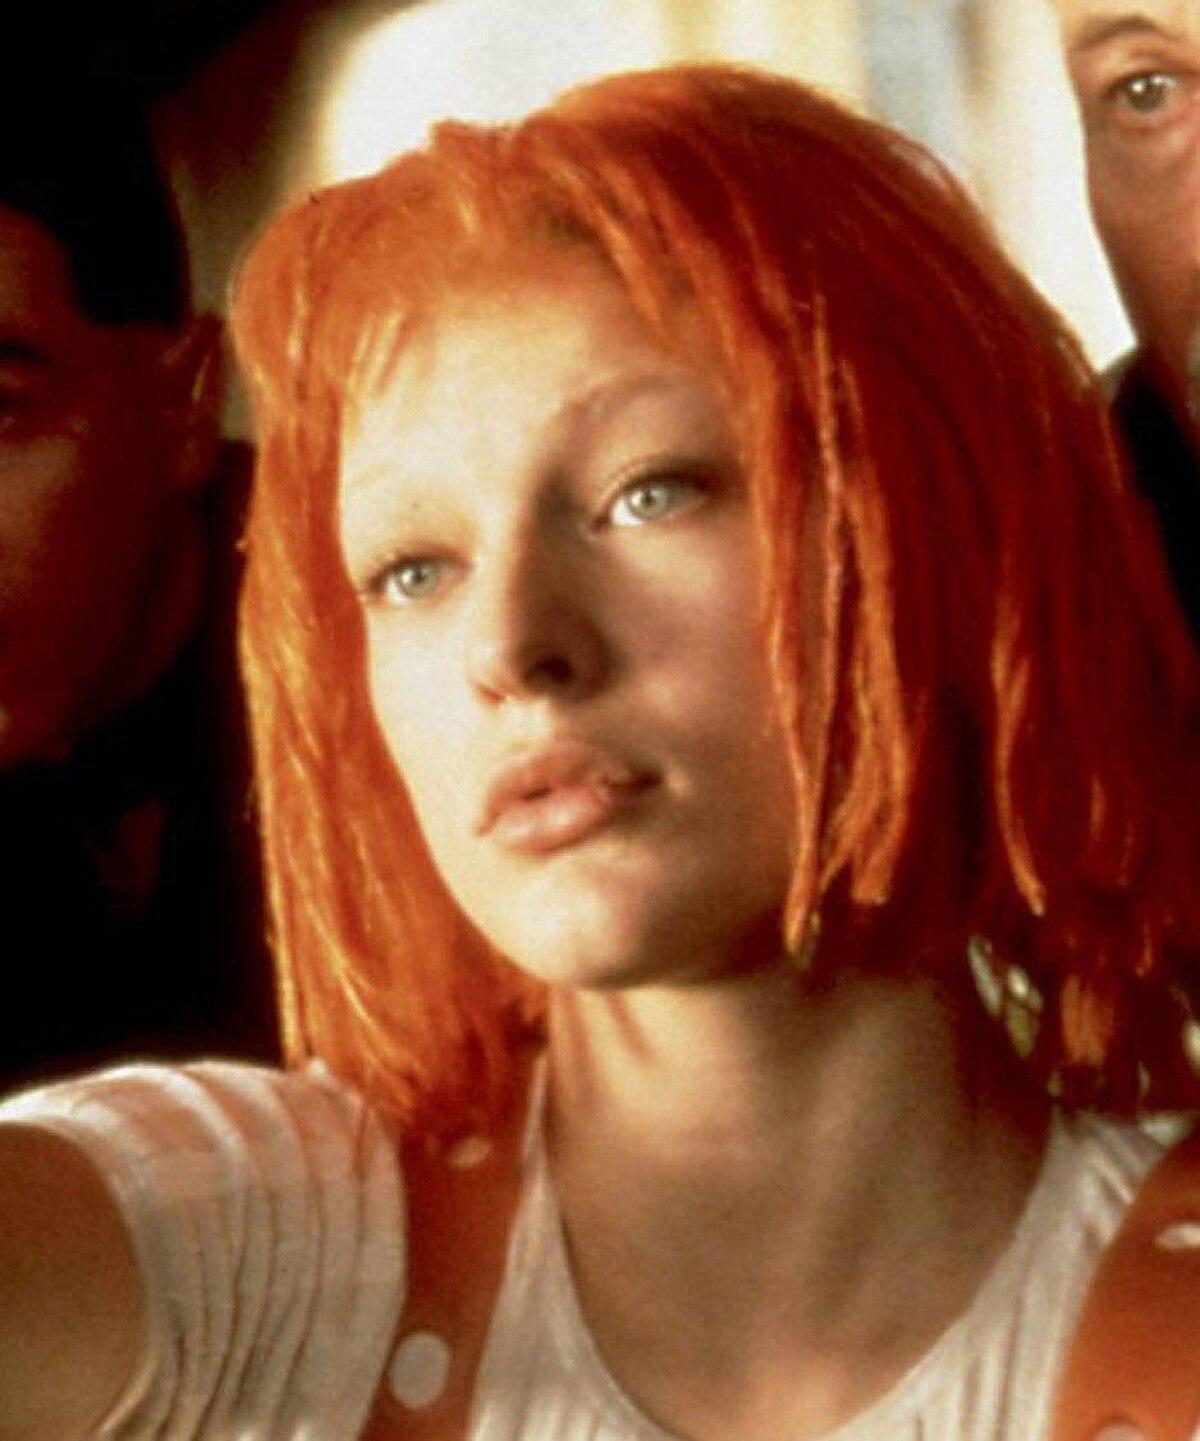 The Fifth Element's Leeloo: Tangerine dream